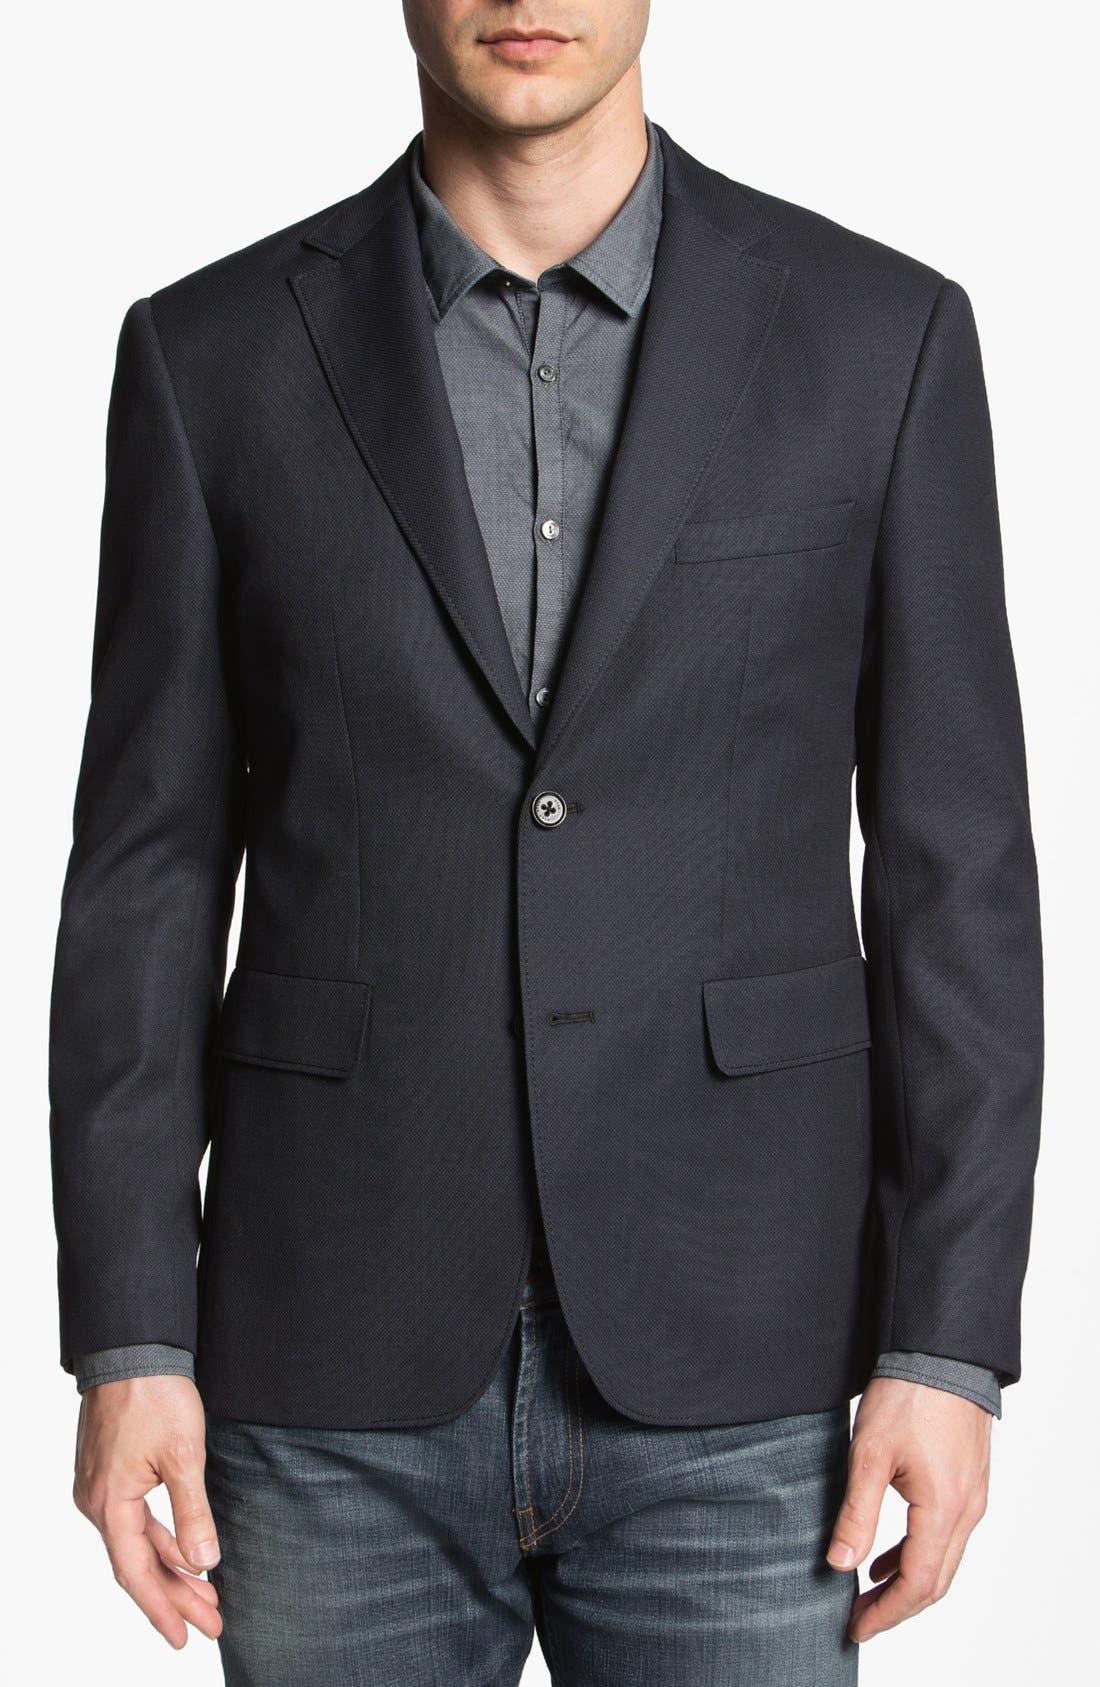 Alternate Image 1 Selected - BOSS Black 'Coastus' Sportcoat